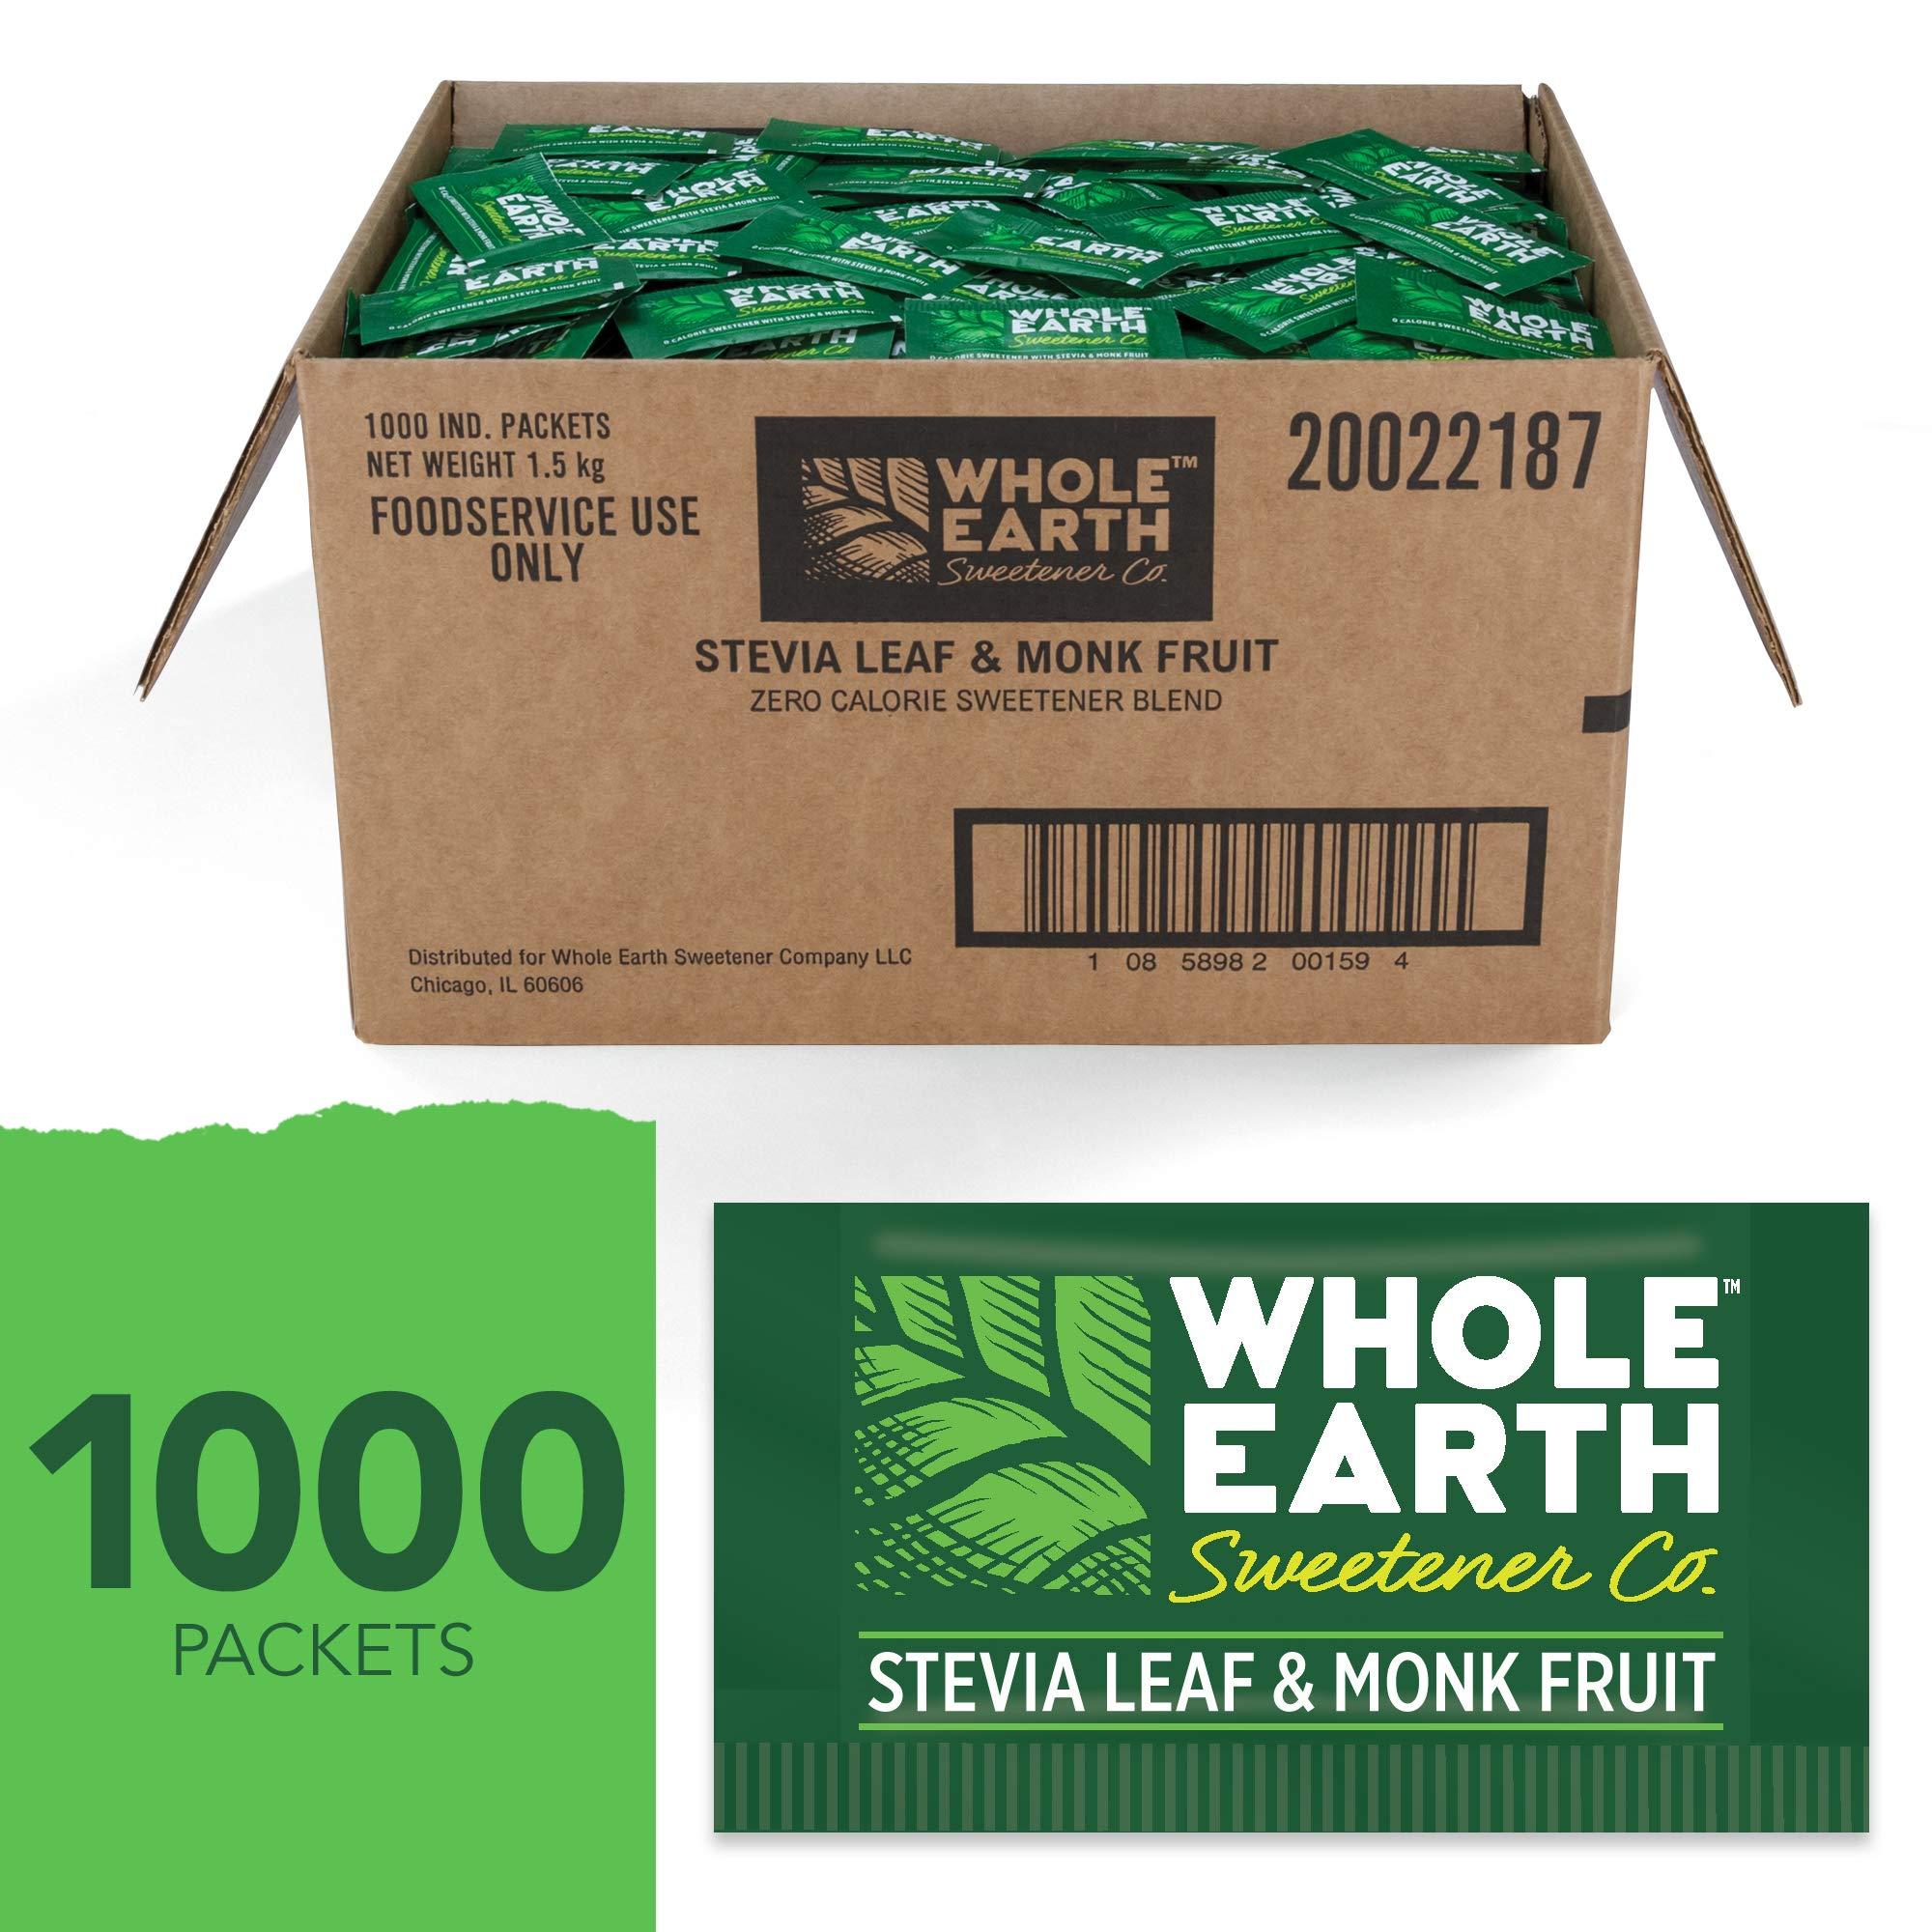 WHOLE EARTH SWEETENER Stevia and Monk Fruit Sweetener, Erythritol Sweetener, Sugar Substitute, Zero Calorie Sweetener, 1,000 Stevia Packets by Whole Earth Sweetener Company